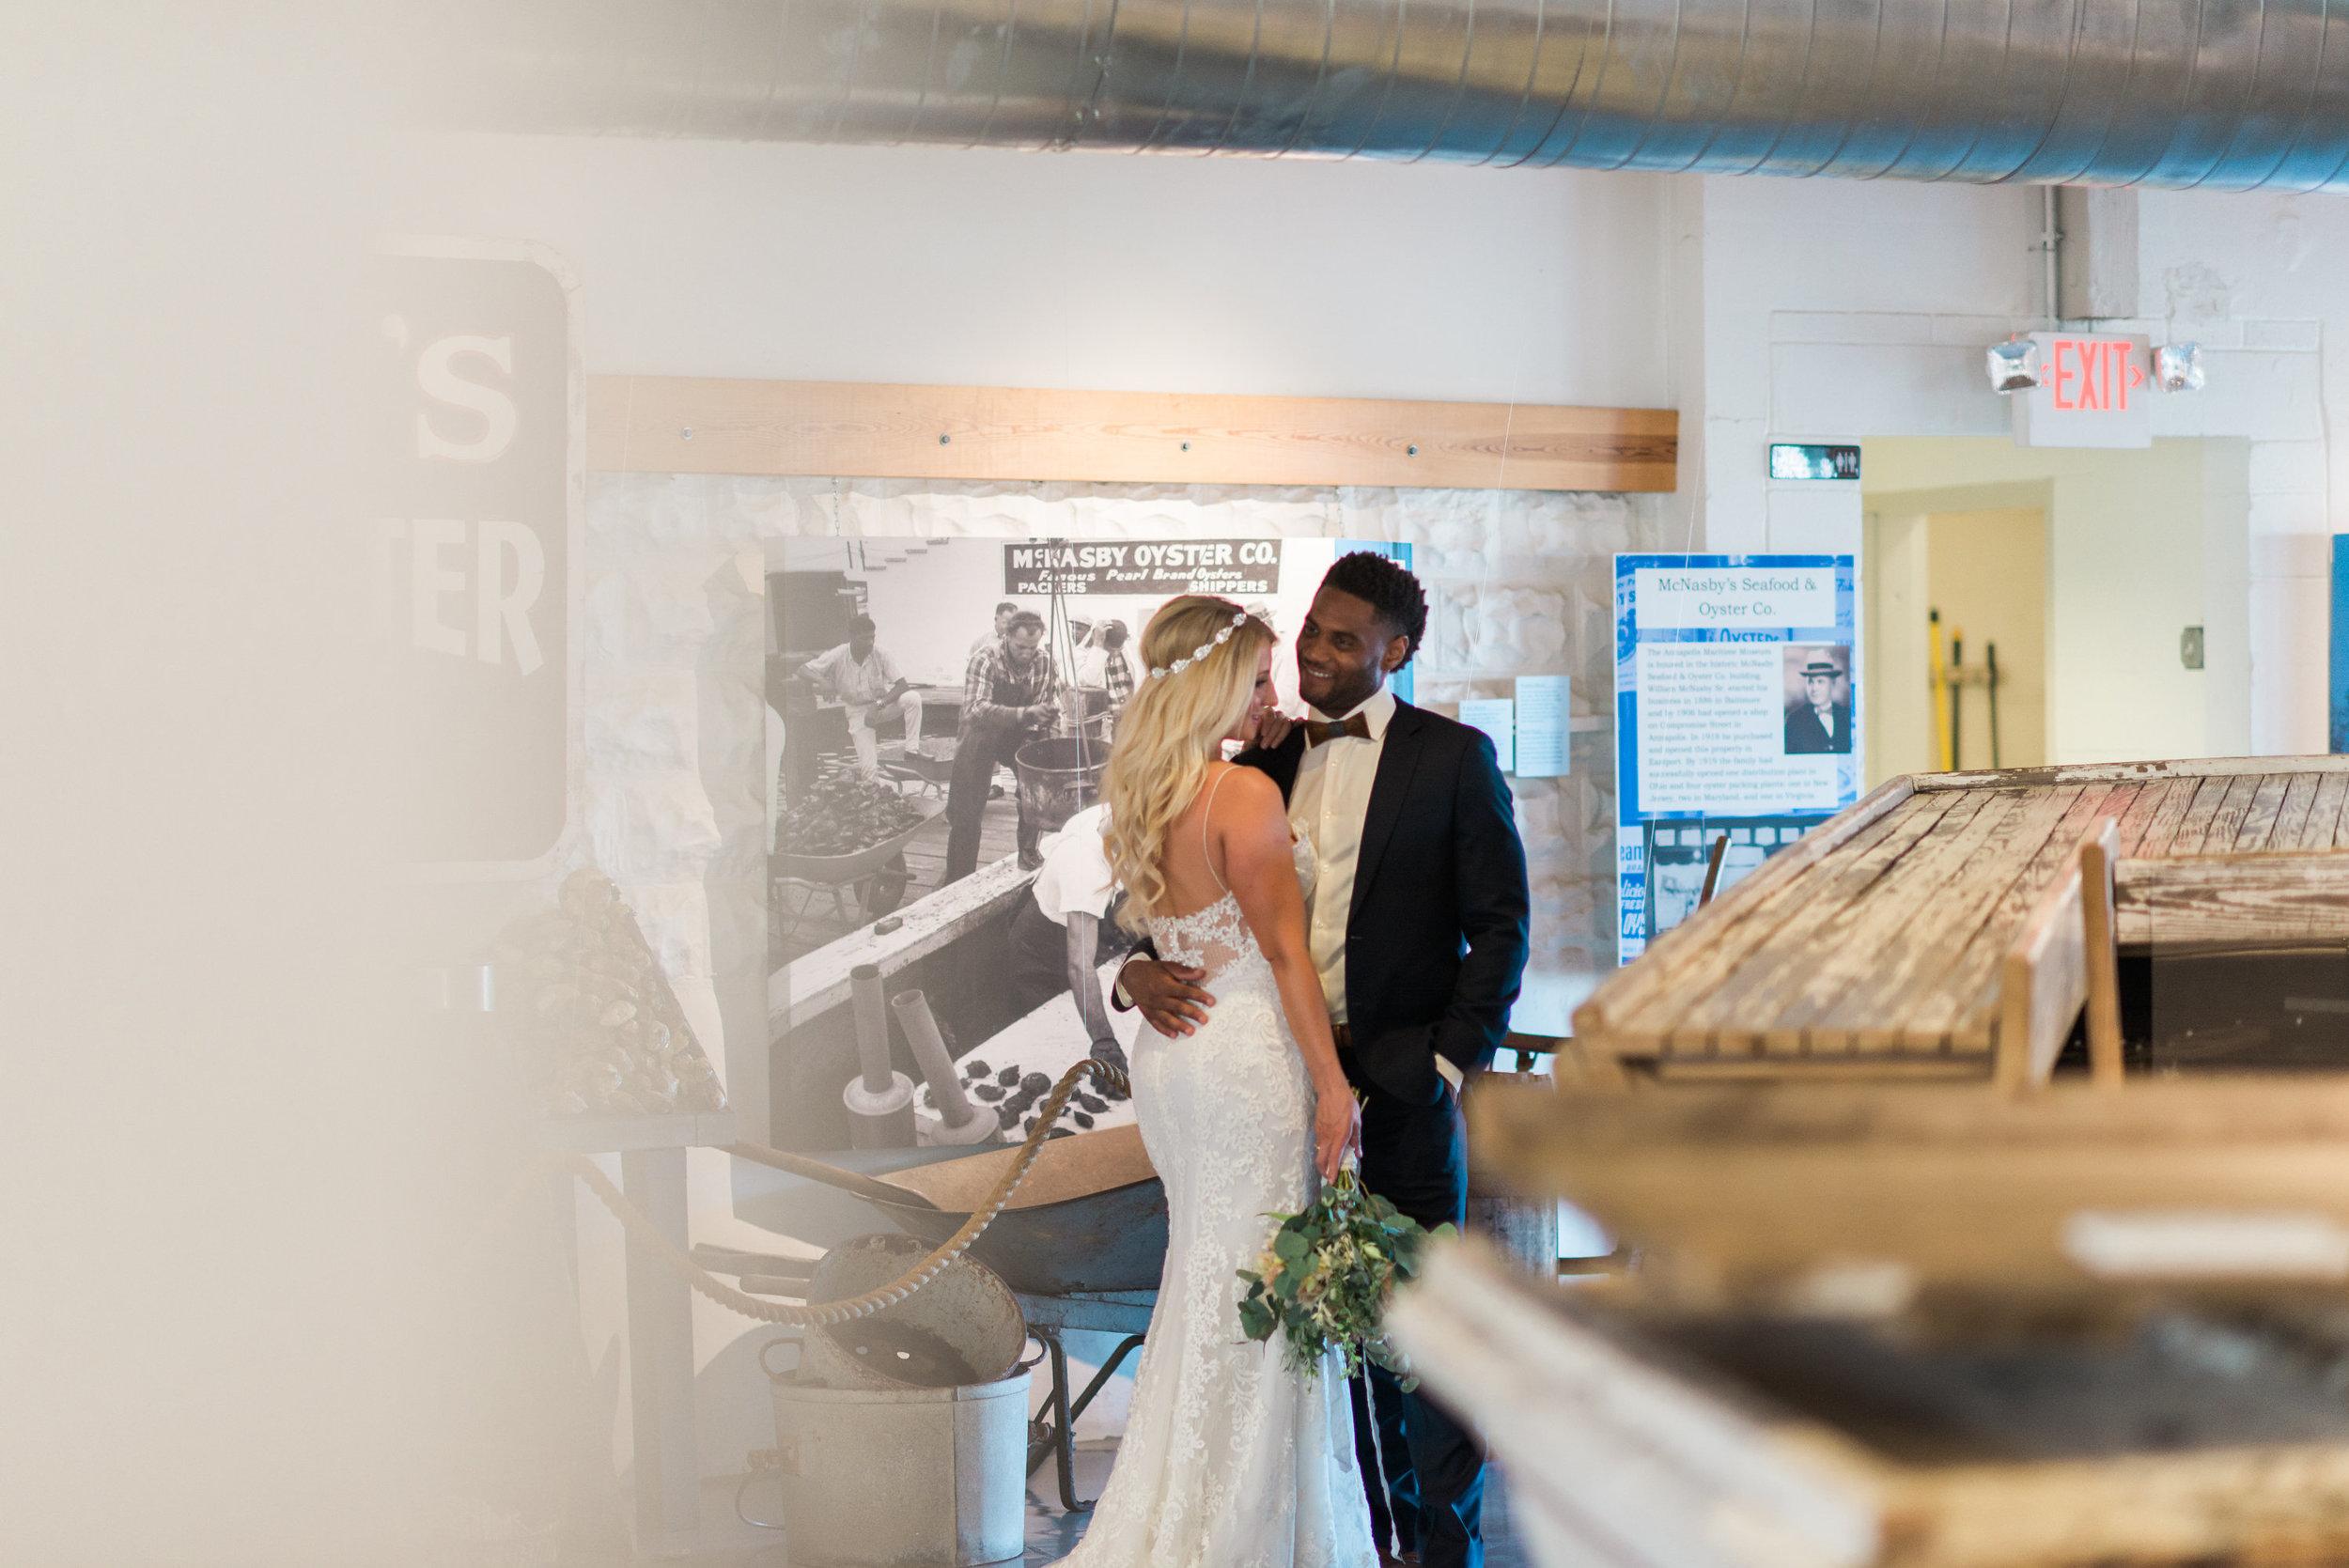 joy-michelle-photography-styled-wedding(90of204).jpg